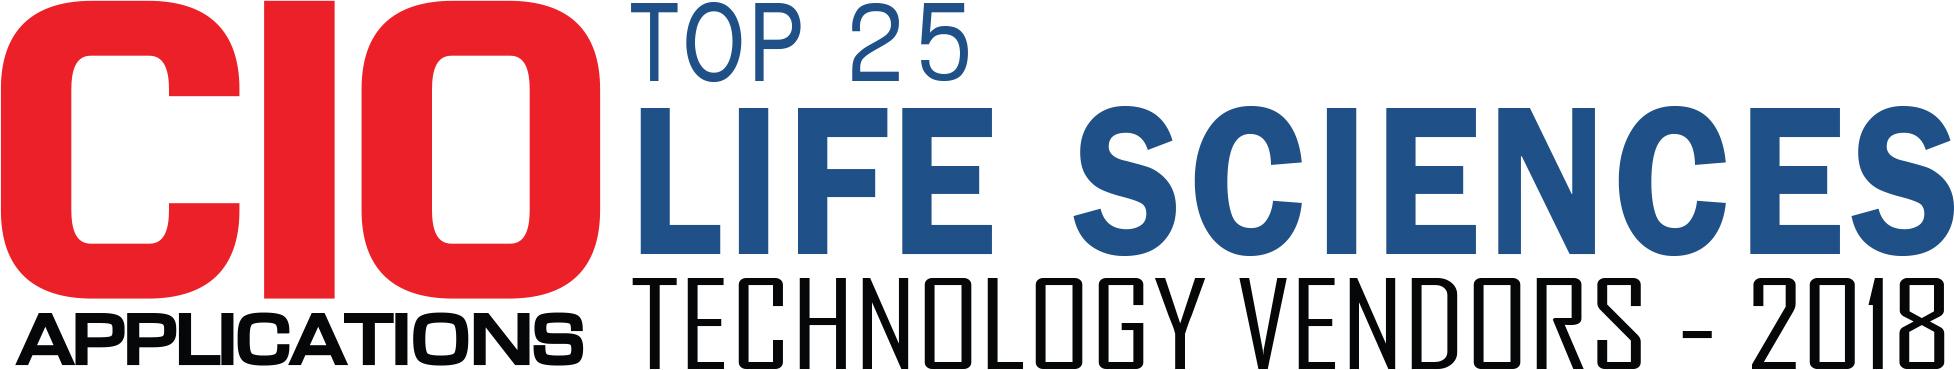 Top Life Sciences Tech Companies